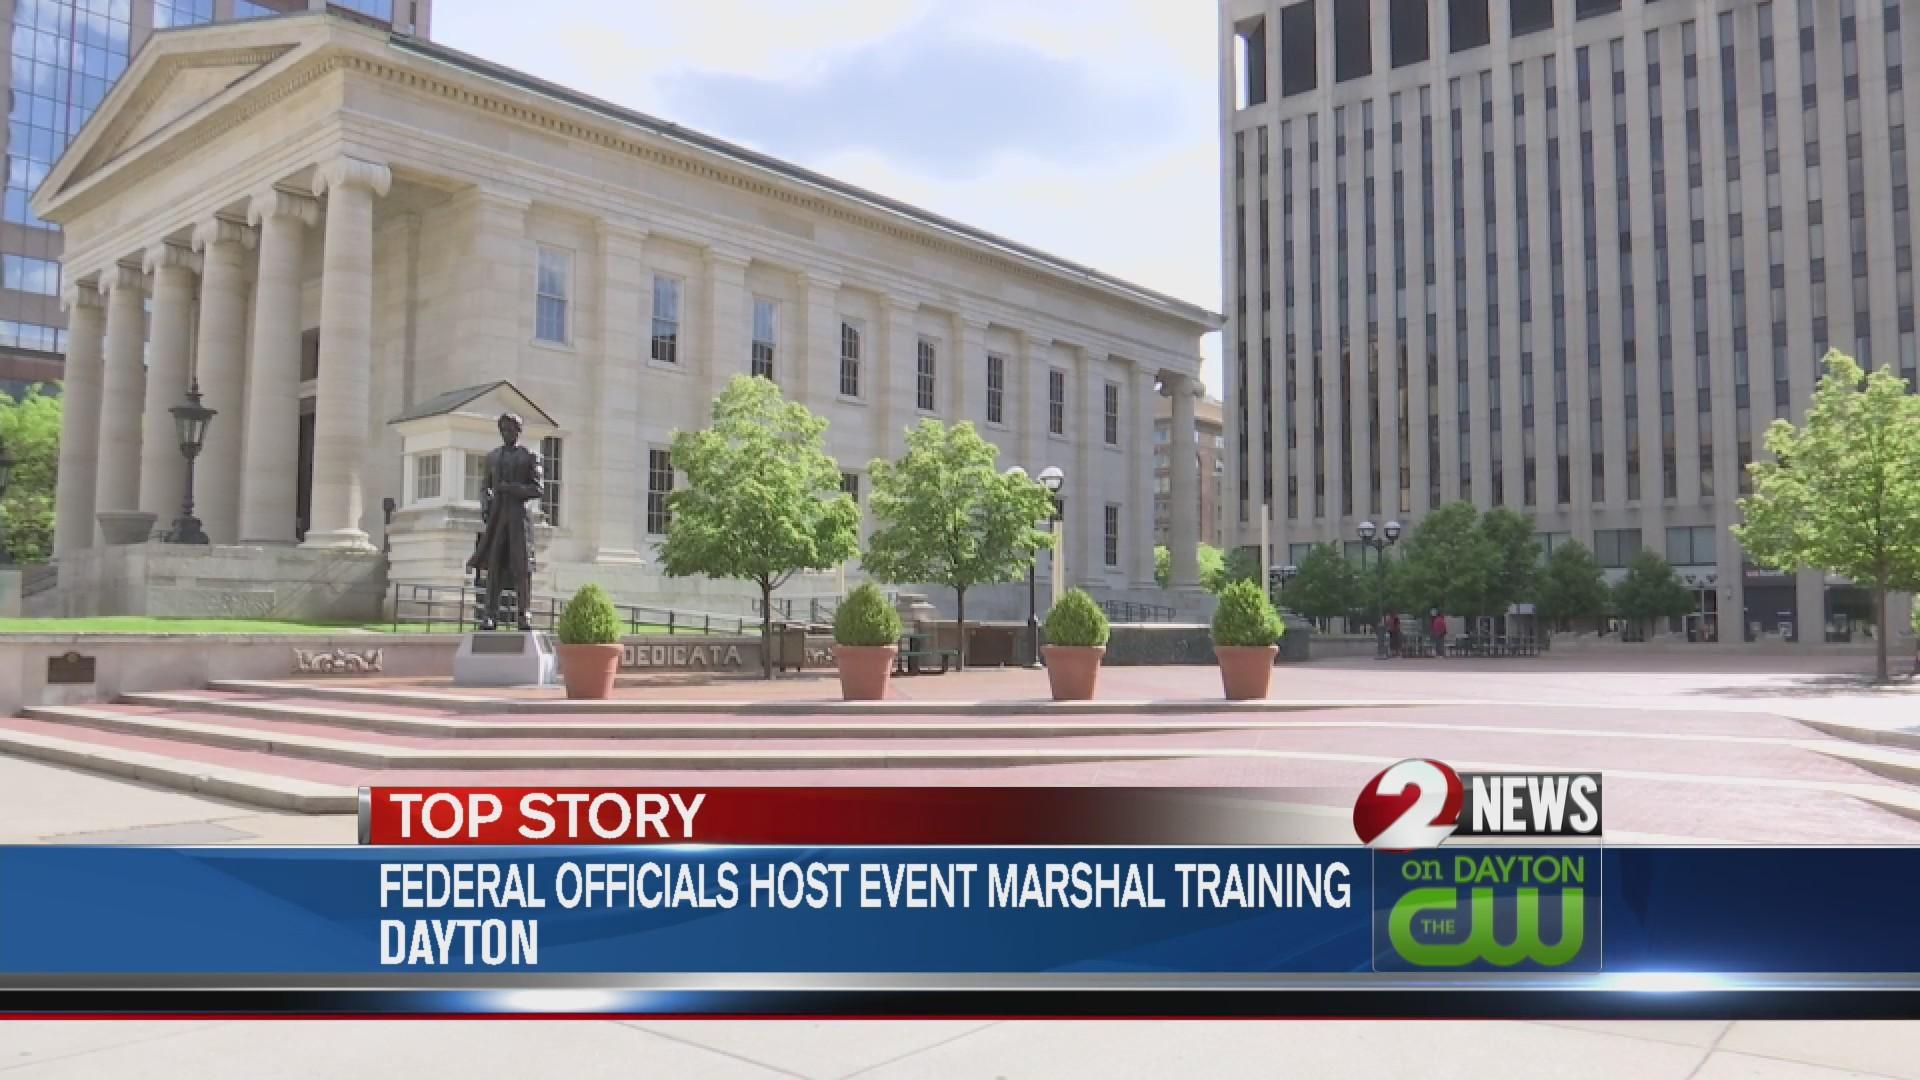 Officials host event marshal training ahead of KKK